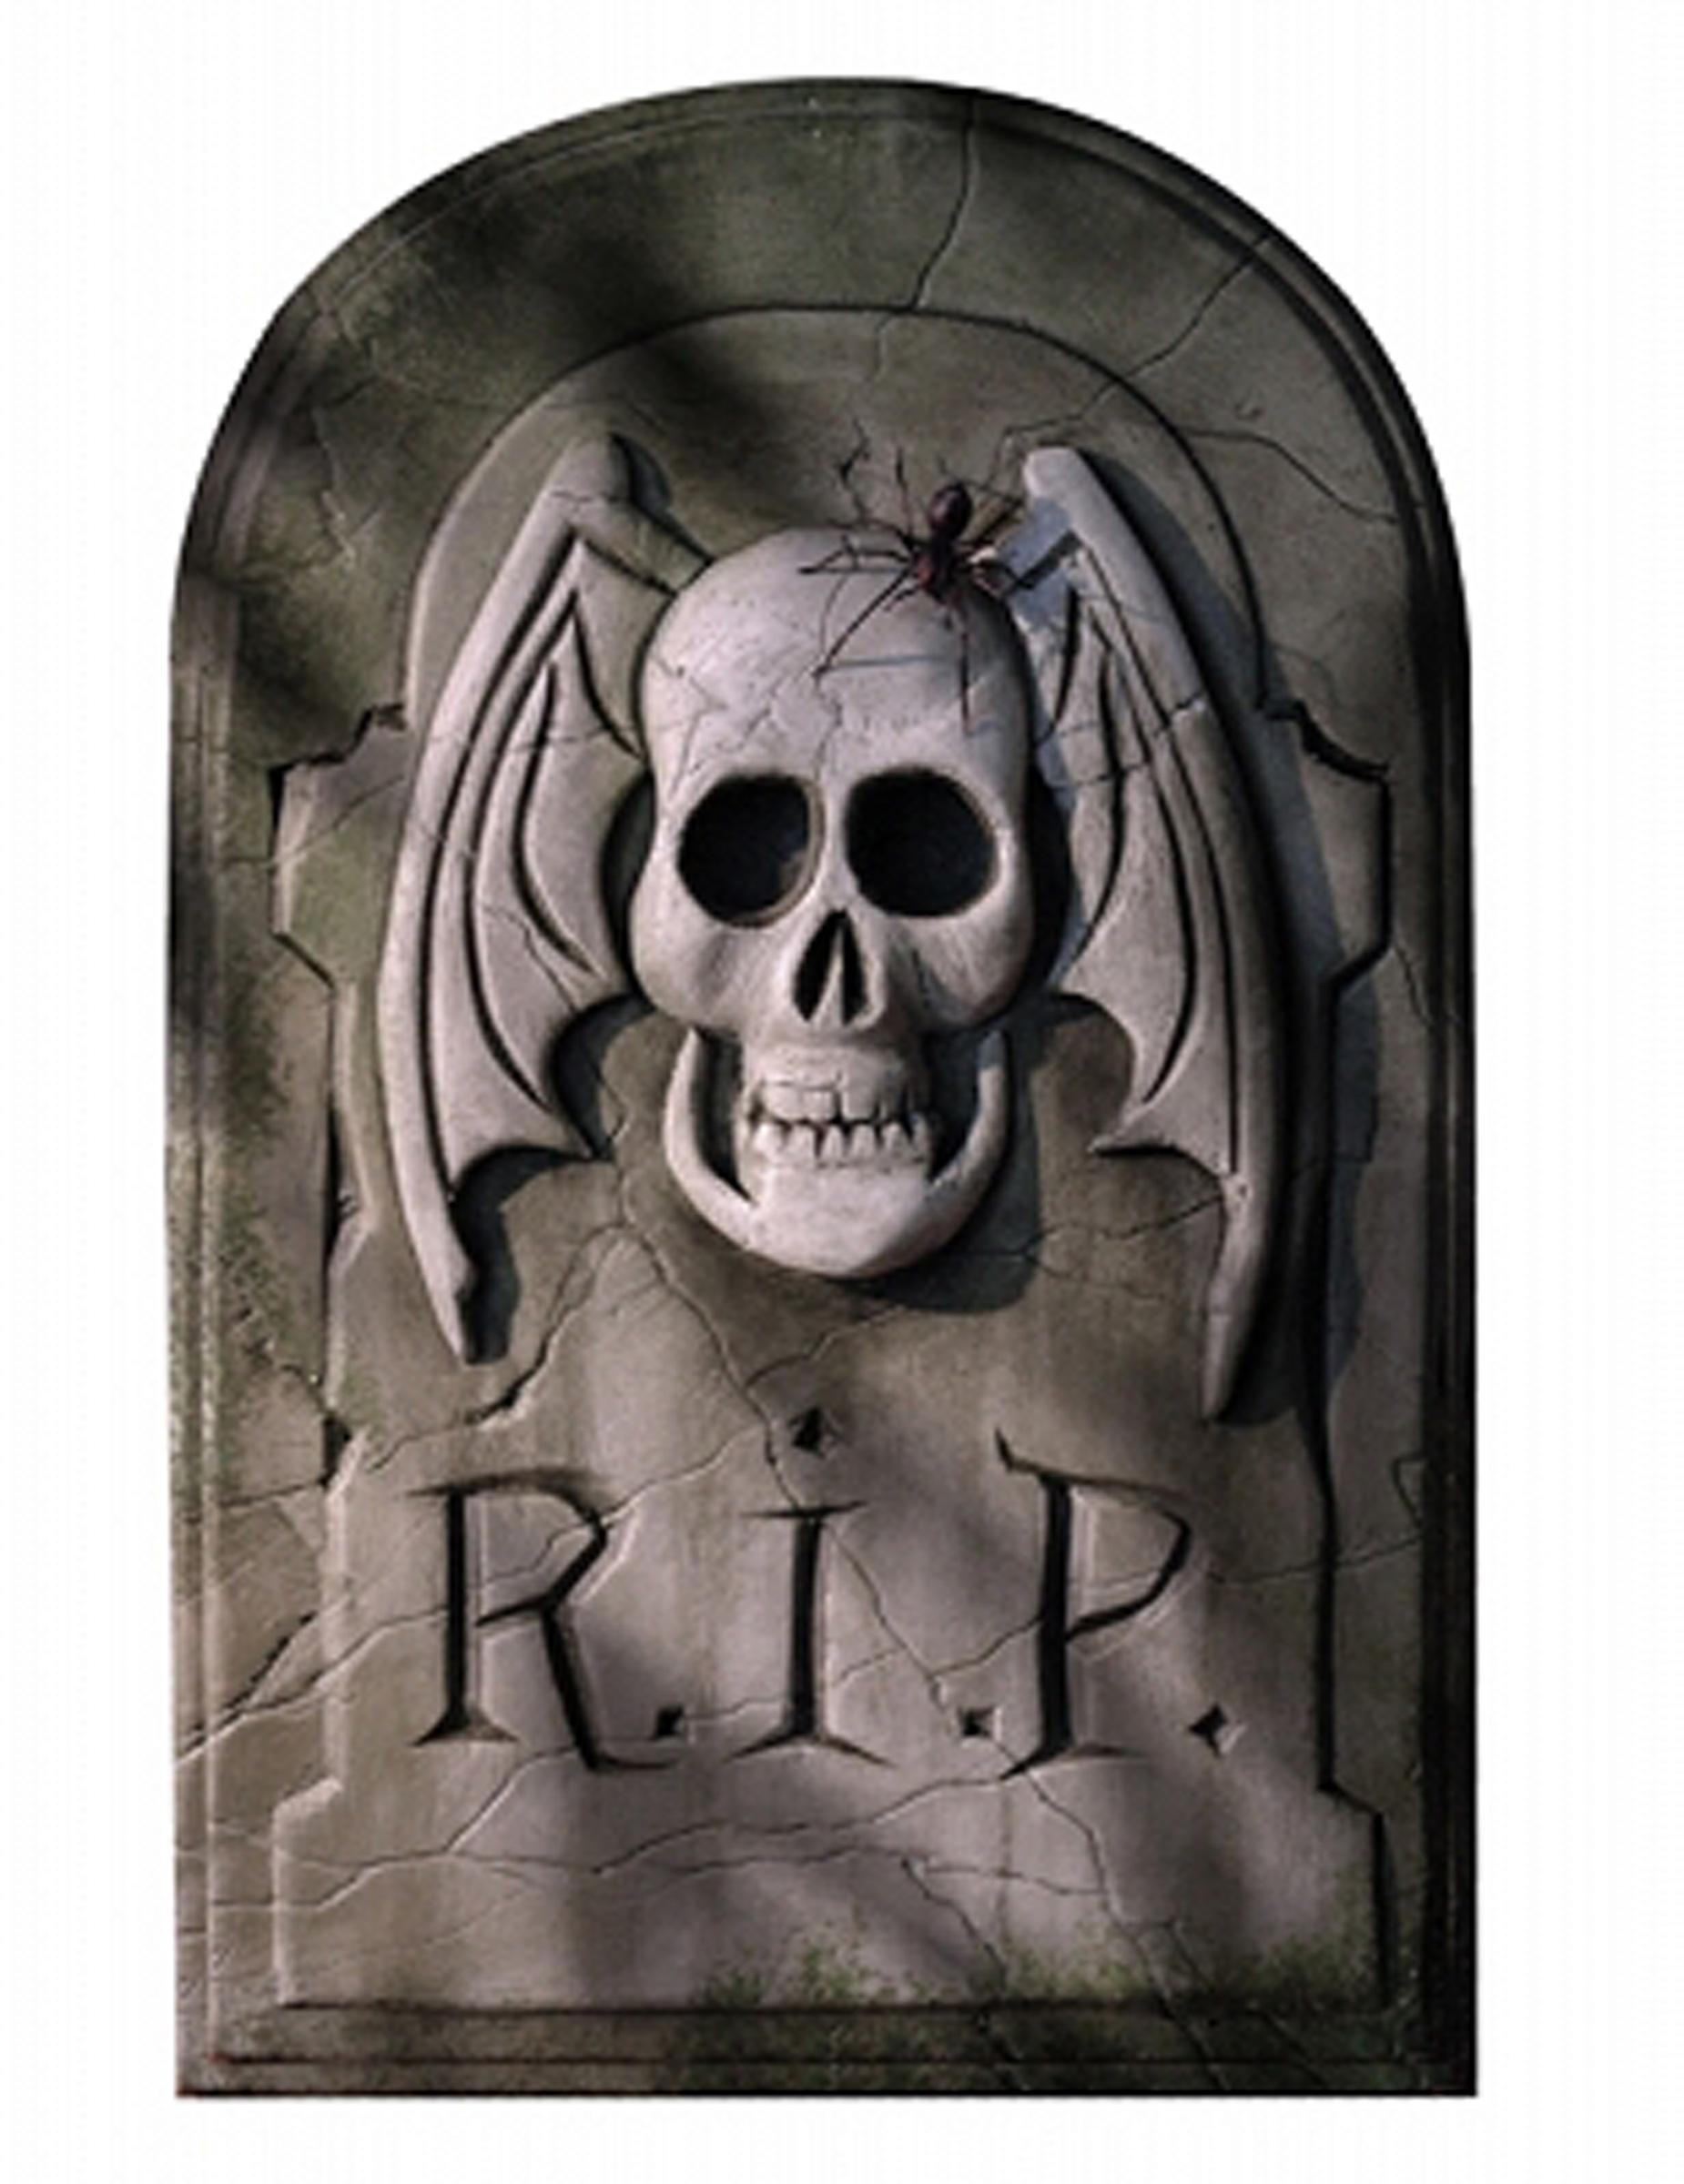 D coration cartonn e pierre tombale halloween 29 x 46 cm - Pierre tombale halloween ...